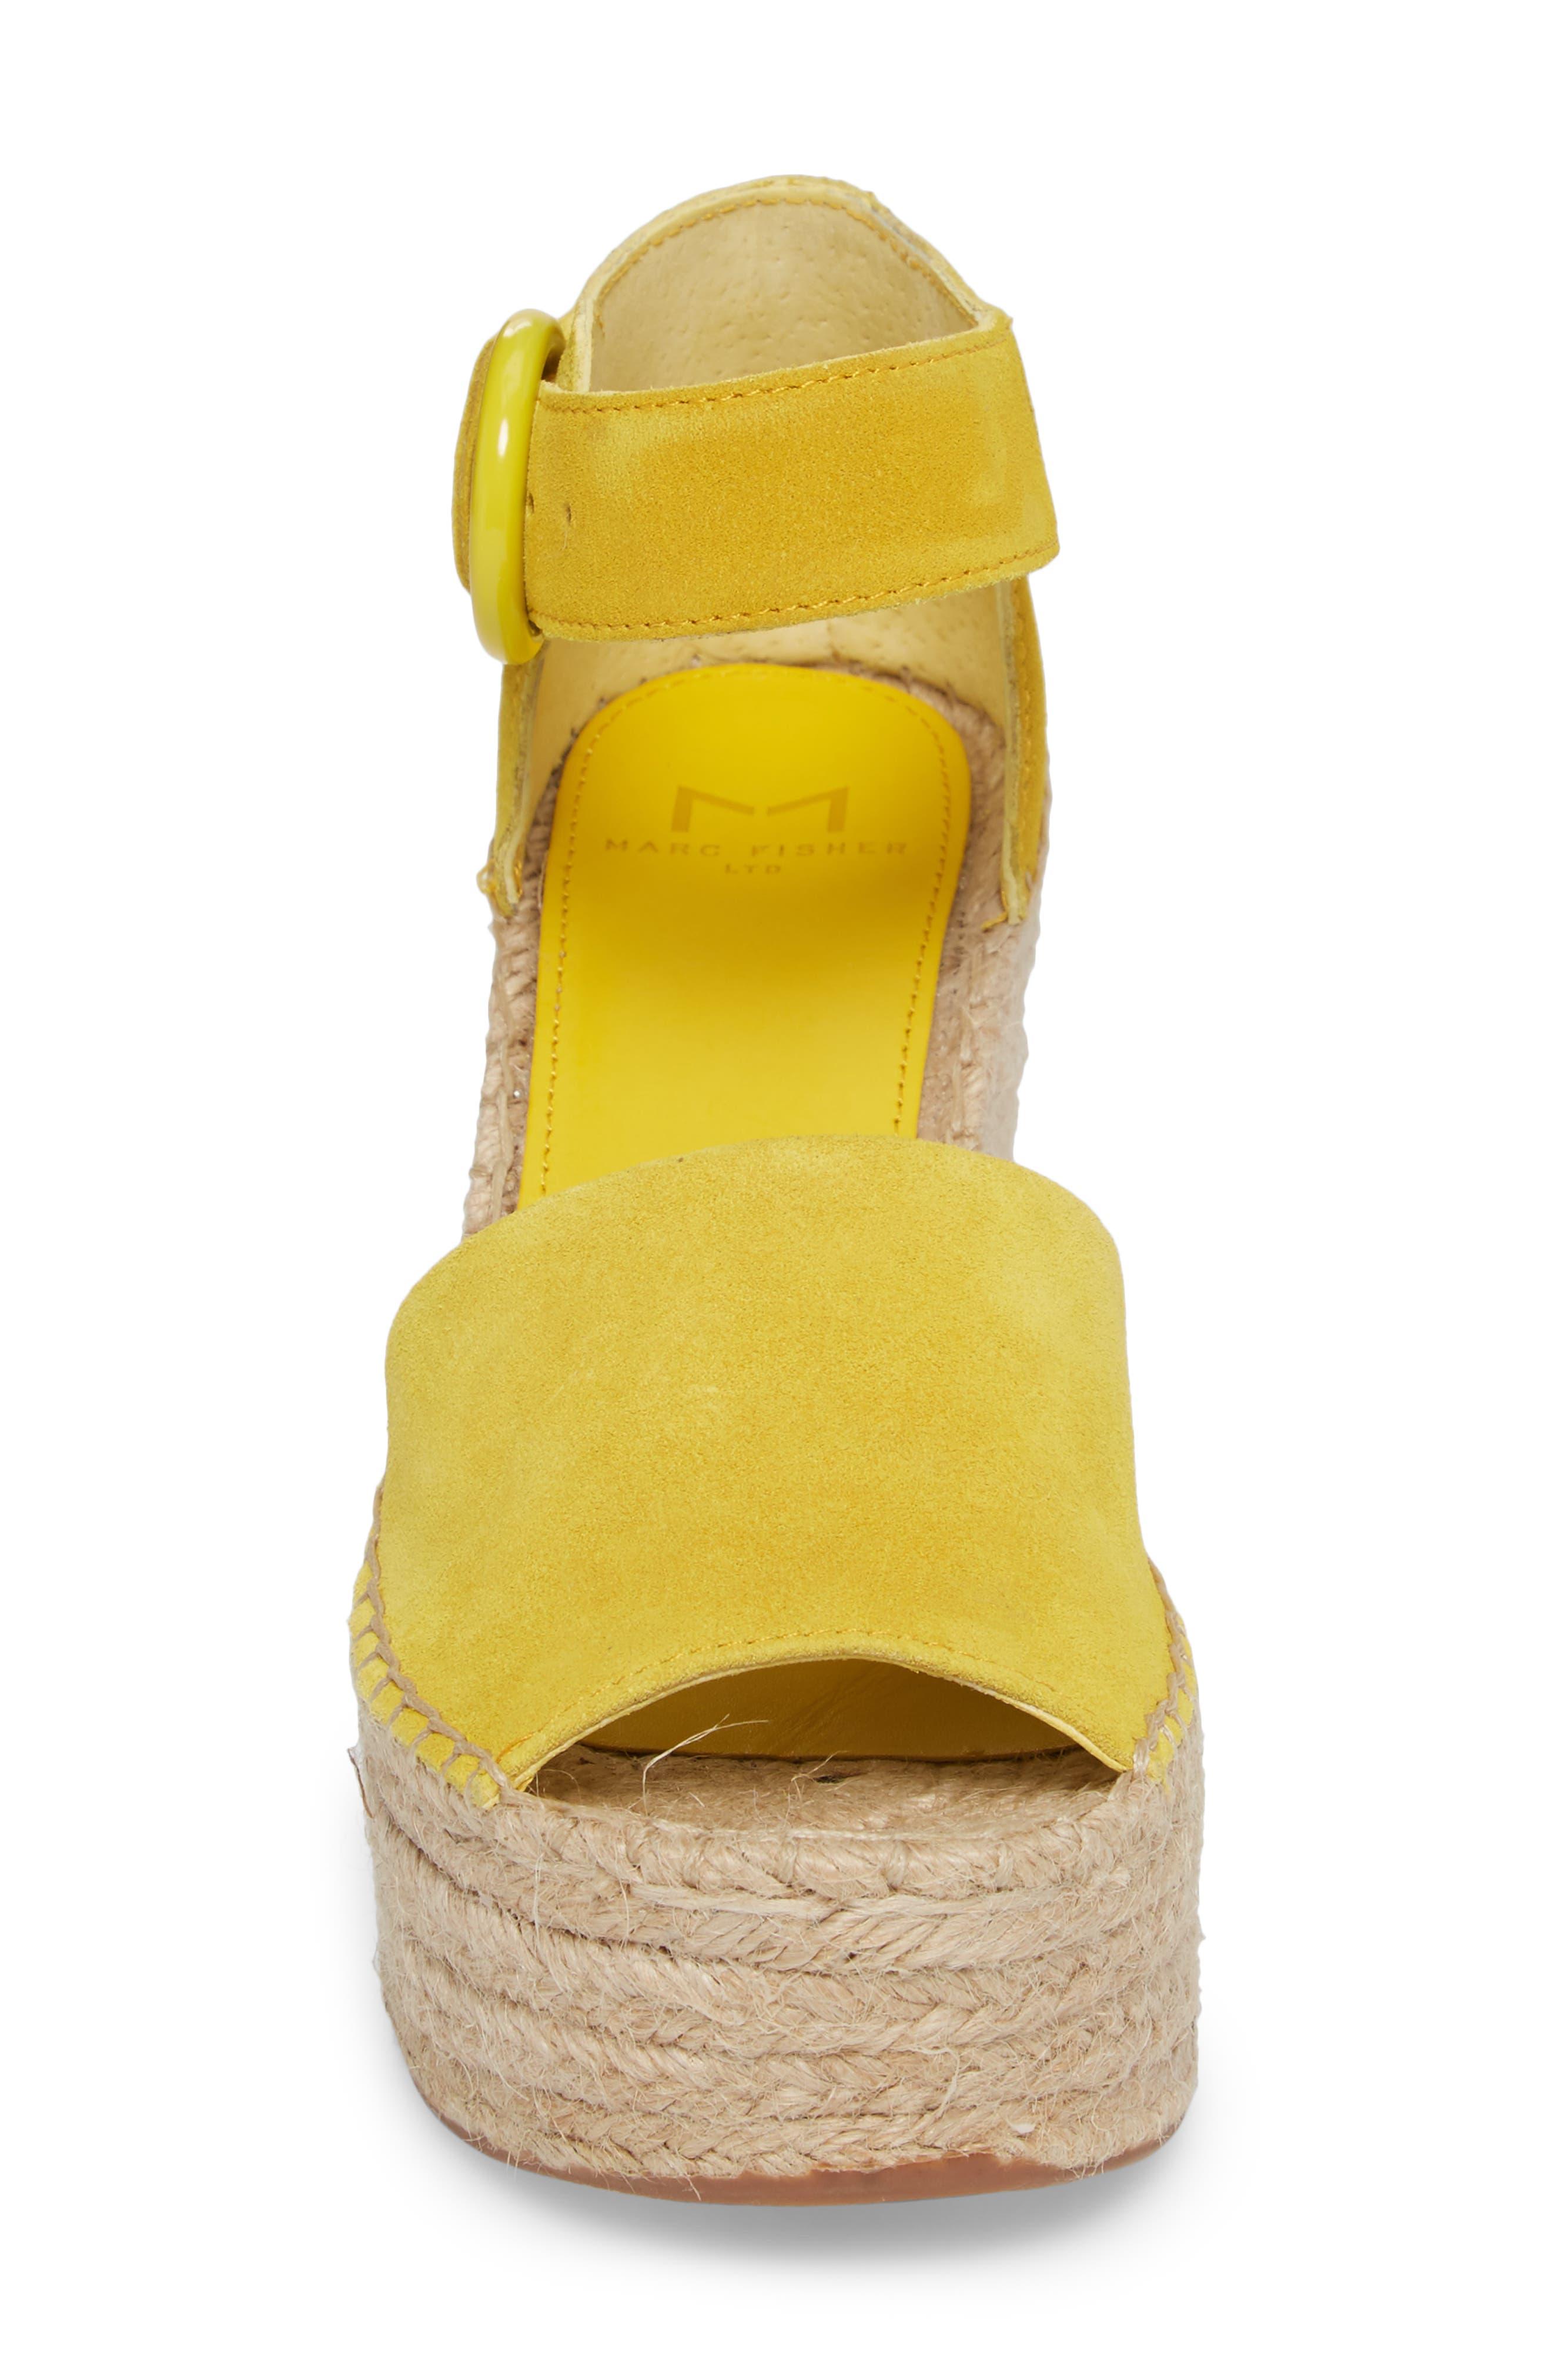 Alida Espadrille Platform Wedge,                             Alternate thumbnail 4, color,                             Yellow Suede